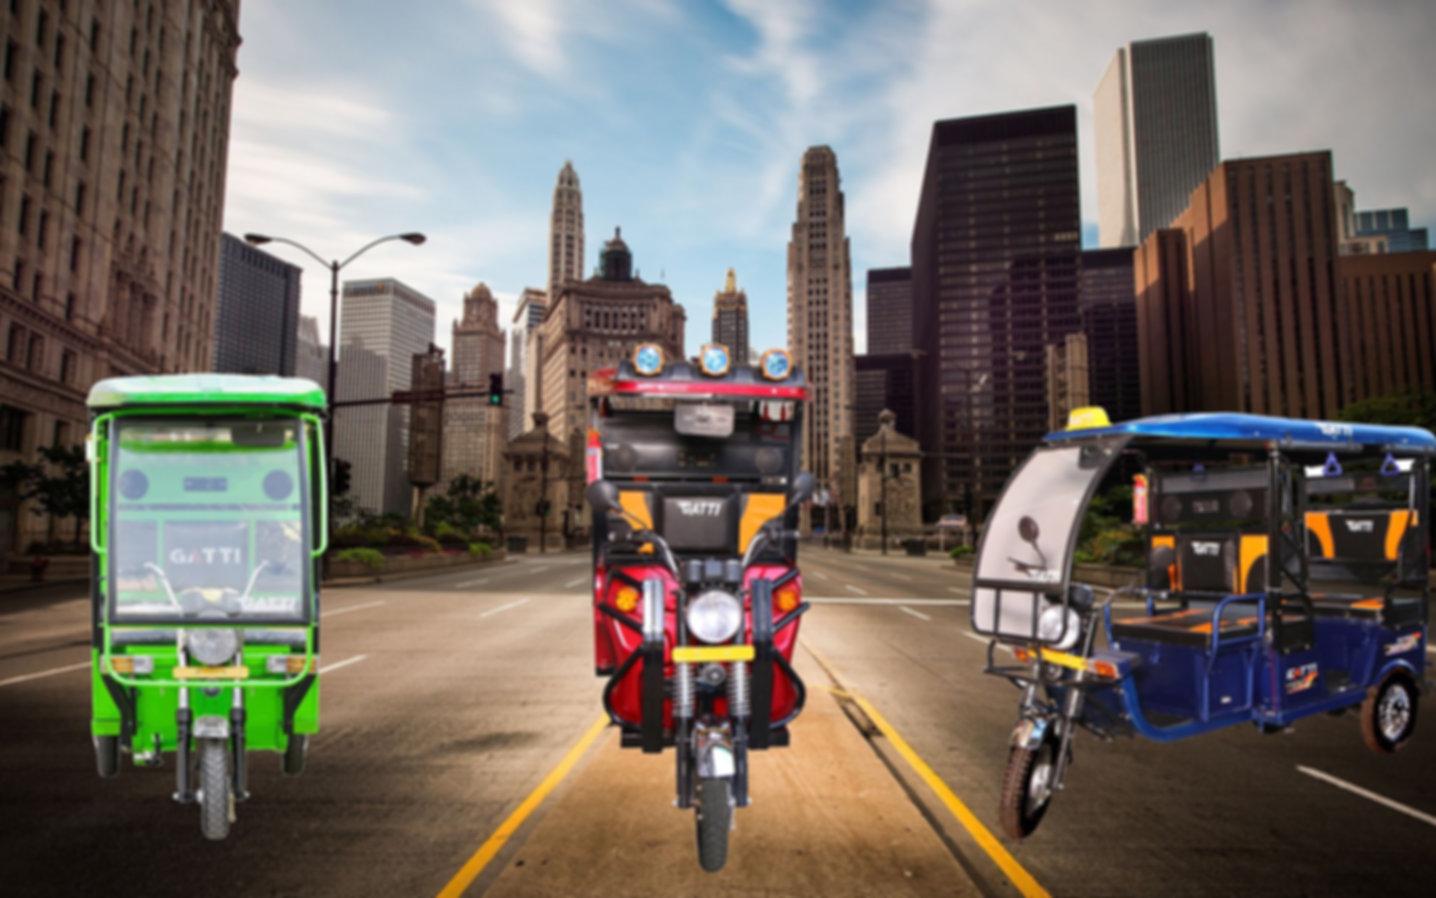 gatti e-rickshaw,electric rickshaw,e rickshaw